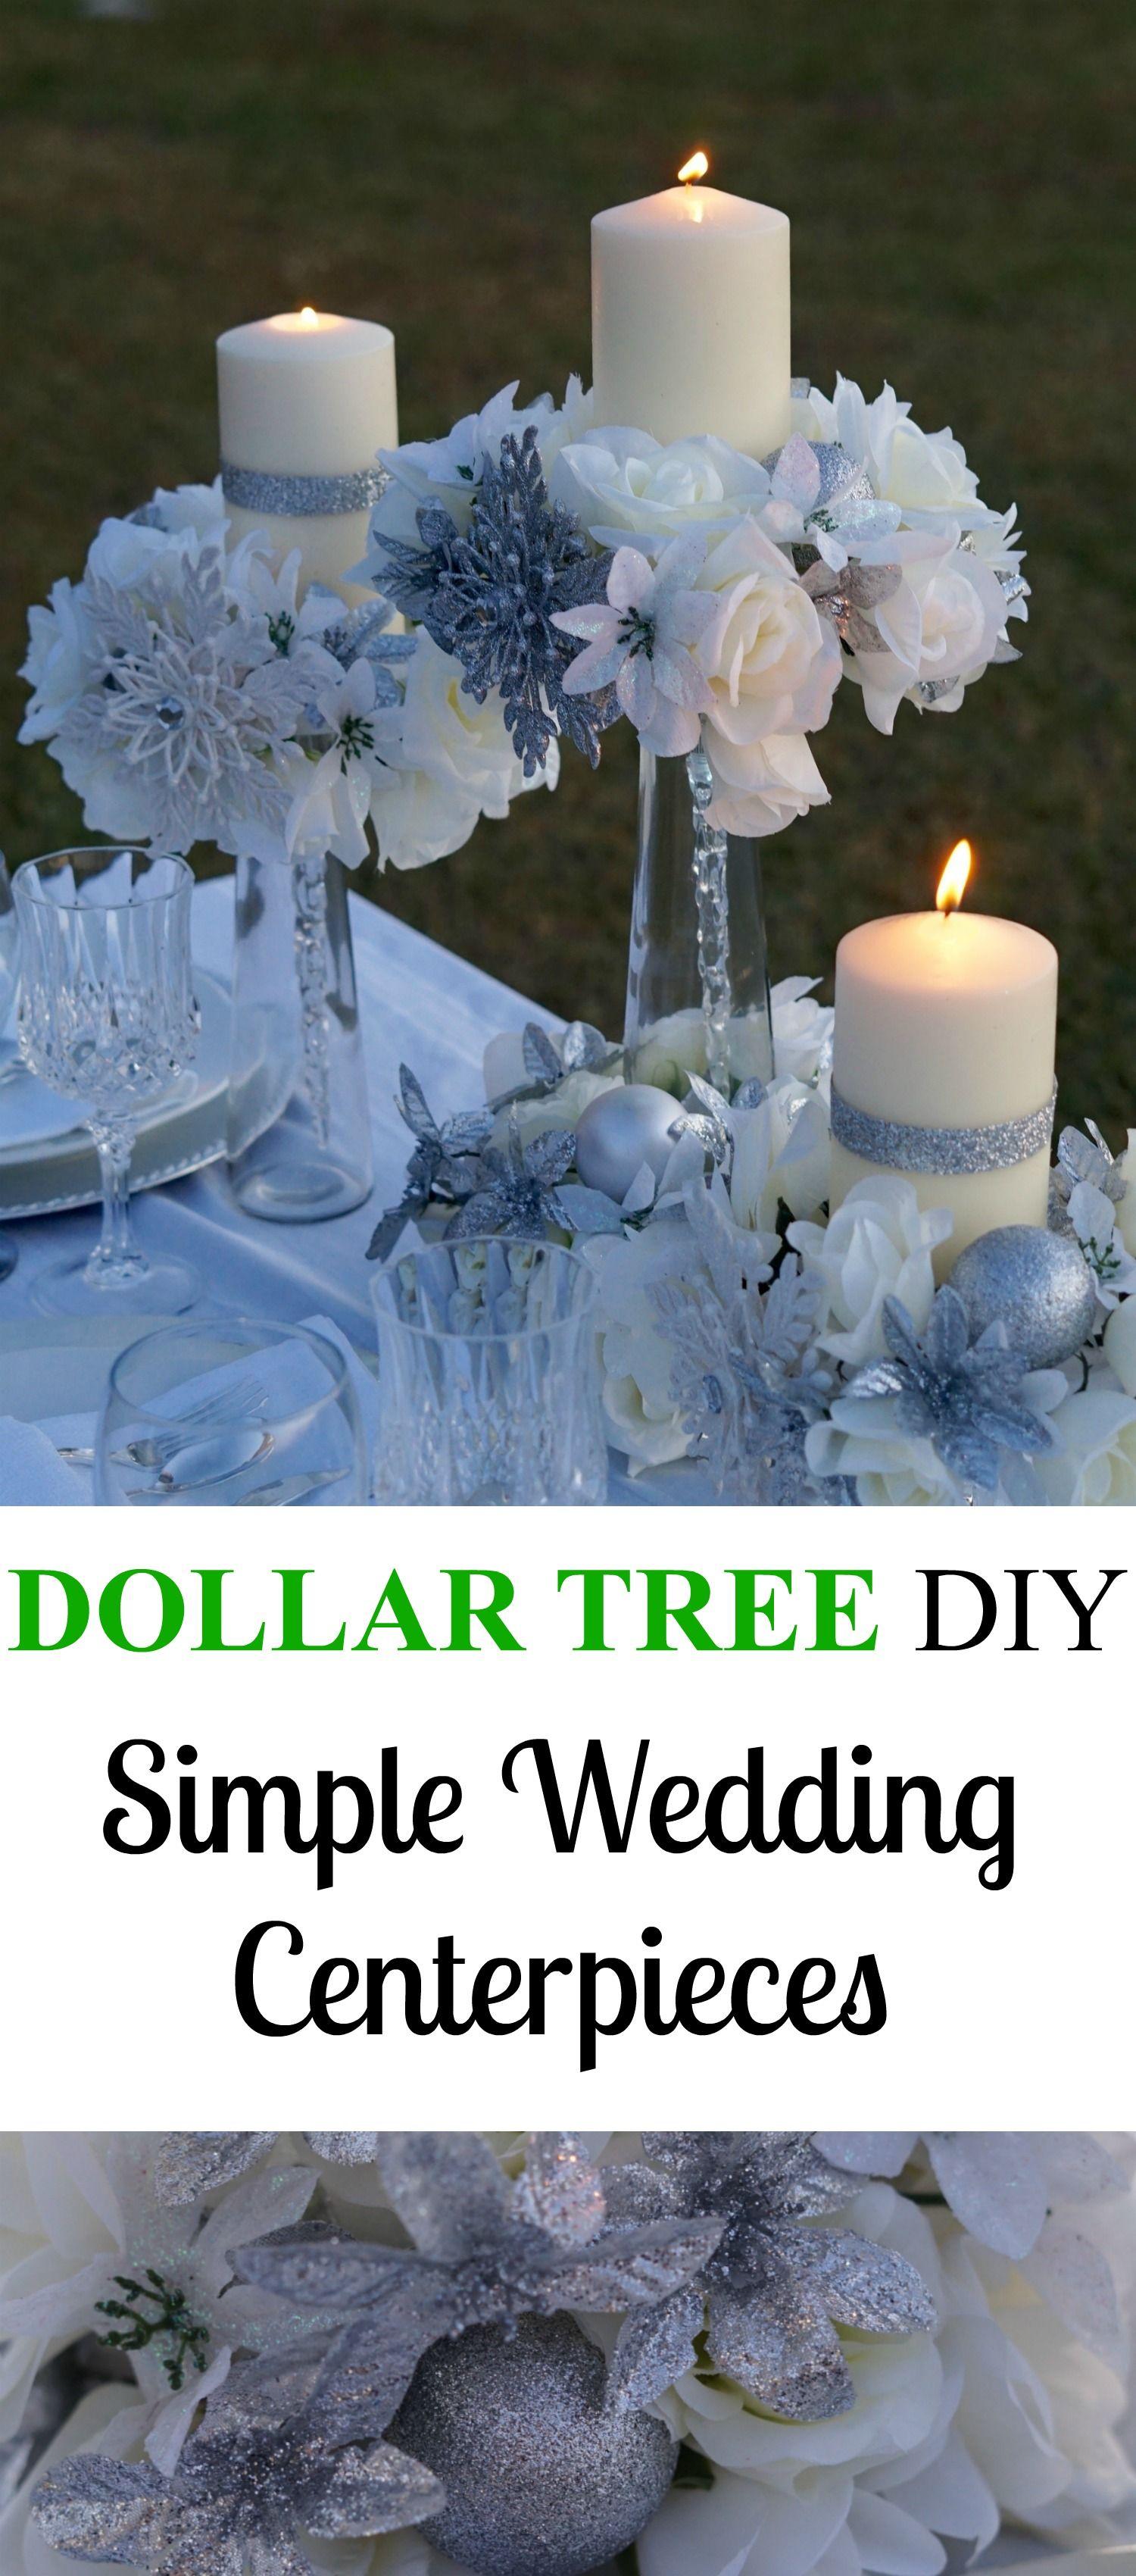 Elegant Dollar Tree Wedding Centerpiece Perfect For A Winter Wedding Simple Wedding Centerpieces Wedding Centerpieces Diy Dollar Tree Wedding Centerpieces